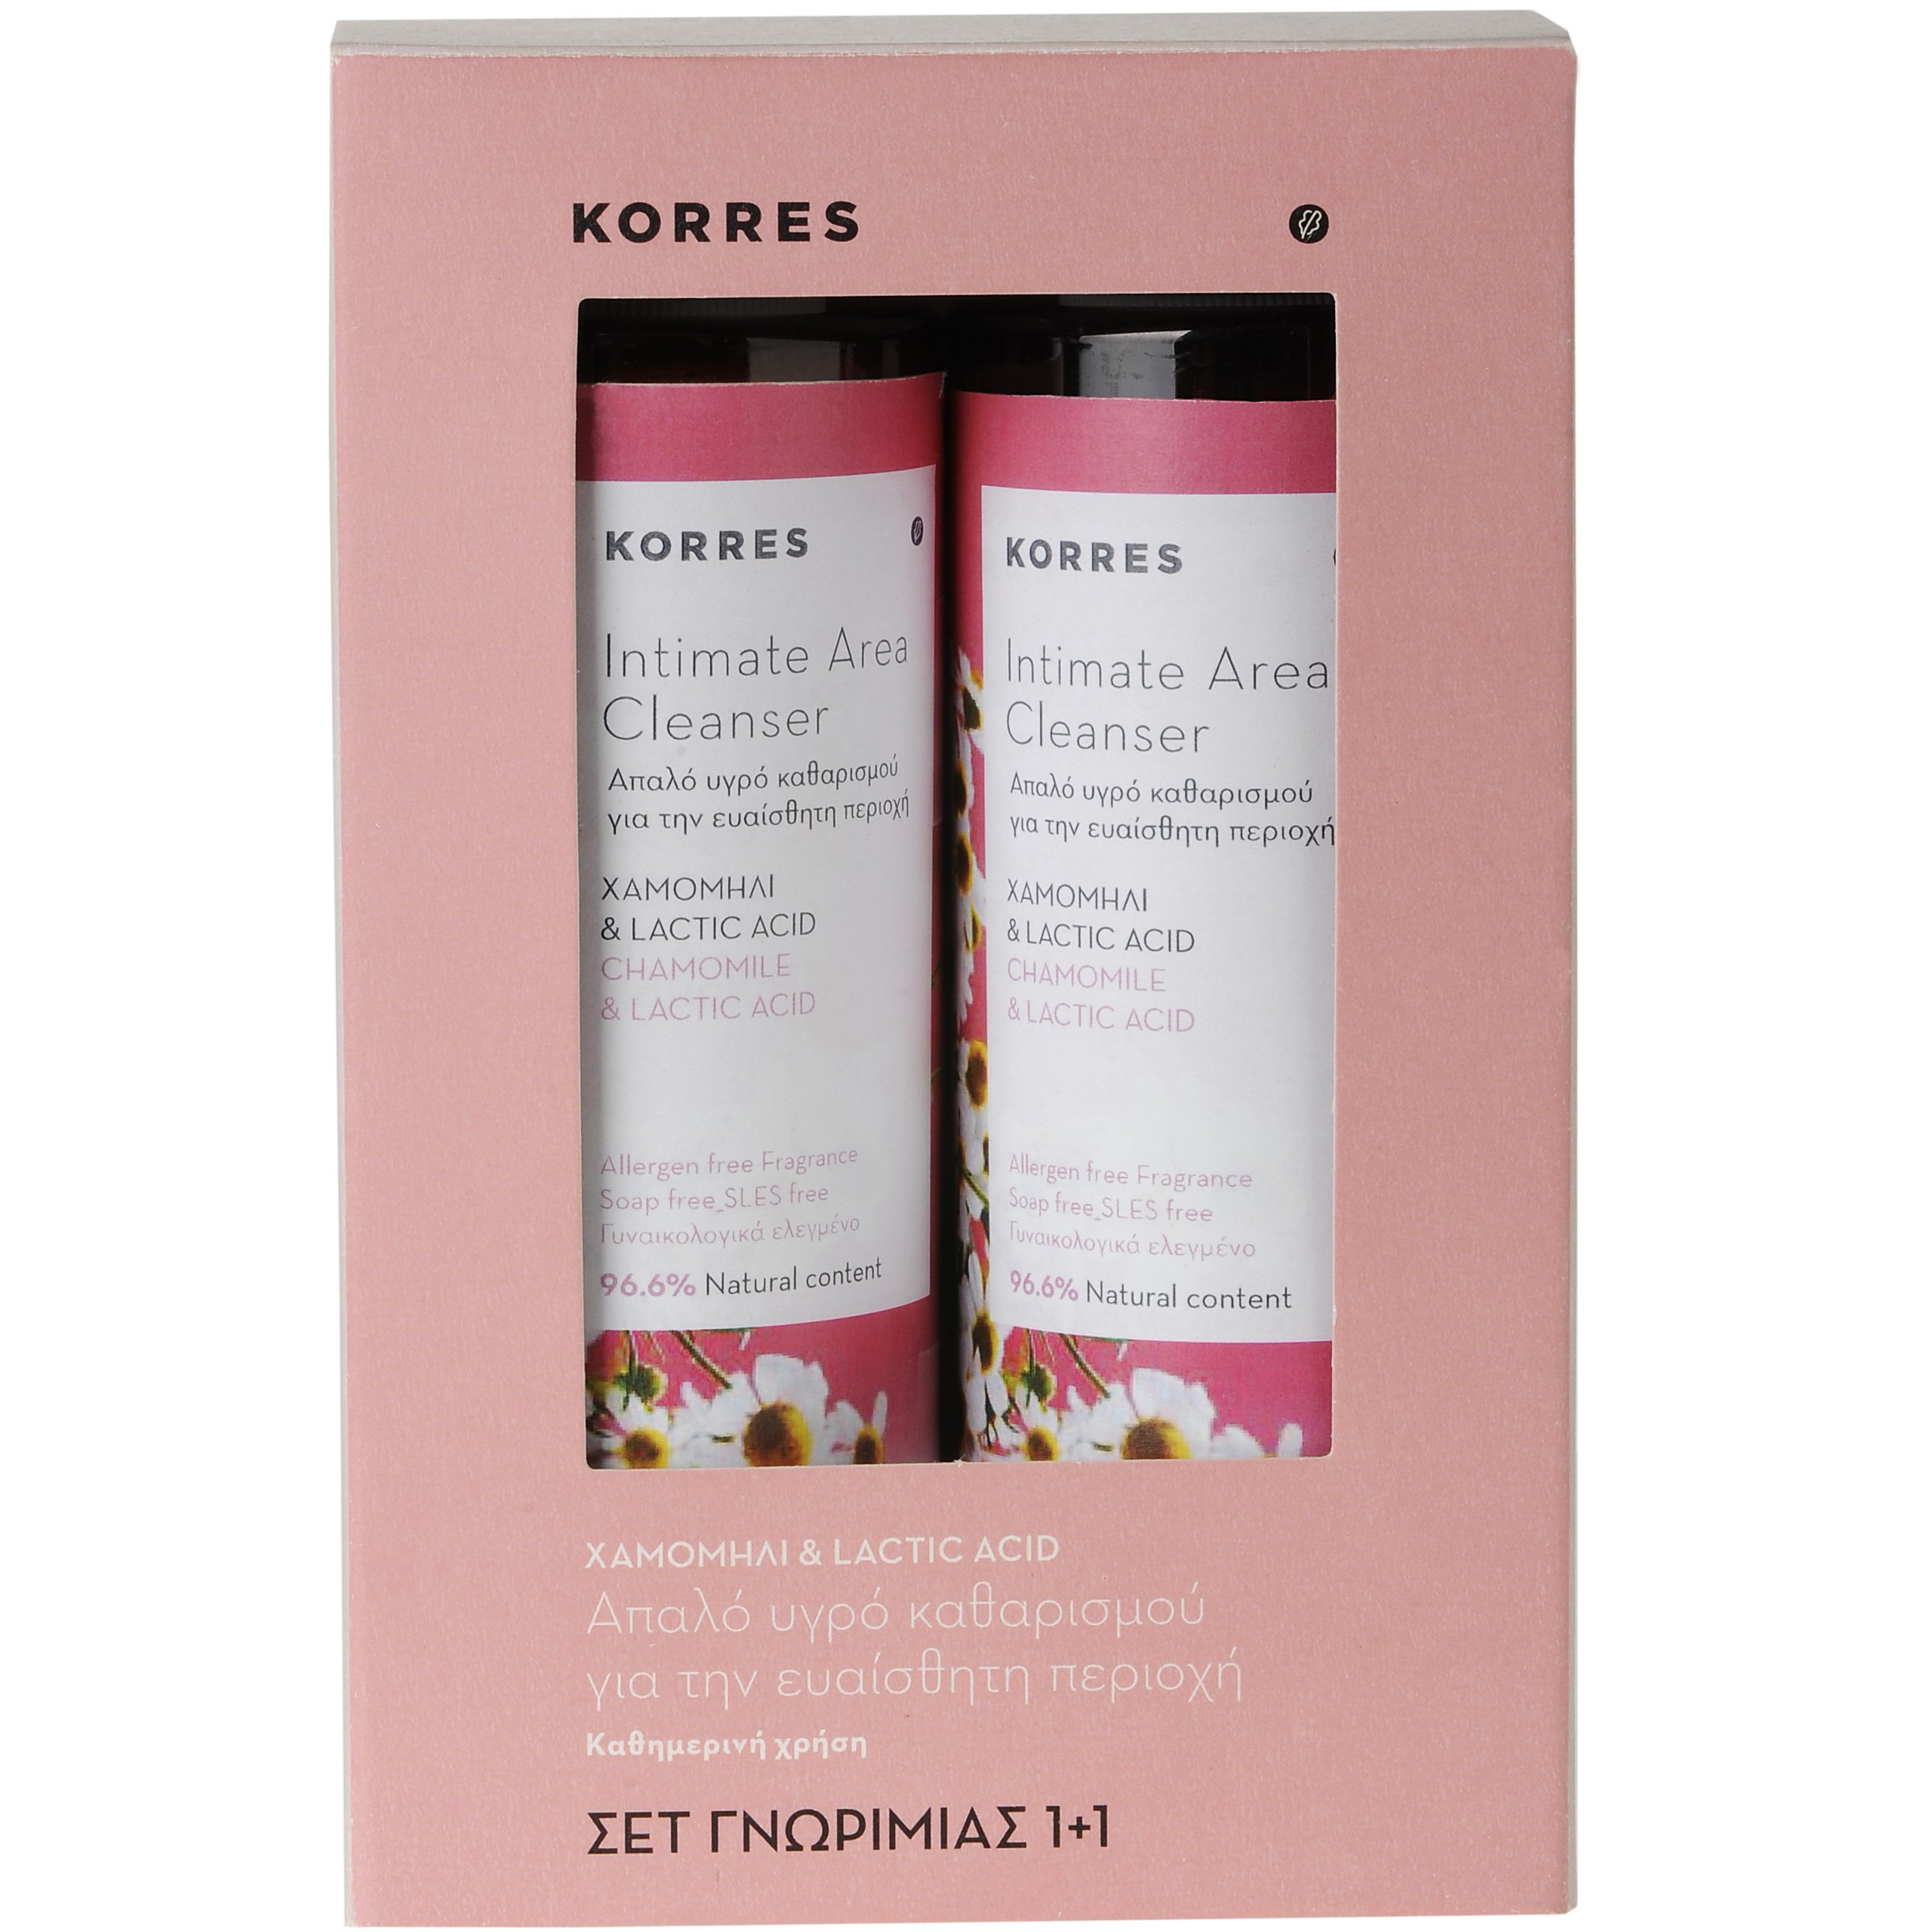 Korres Πακέτο Προσφοράς Intimate Area Cleanser Με Χαμομήλι & Lactic Acid για την Ευαίσθητη Περιοχή 1+1 Δώρο 2x250ml